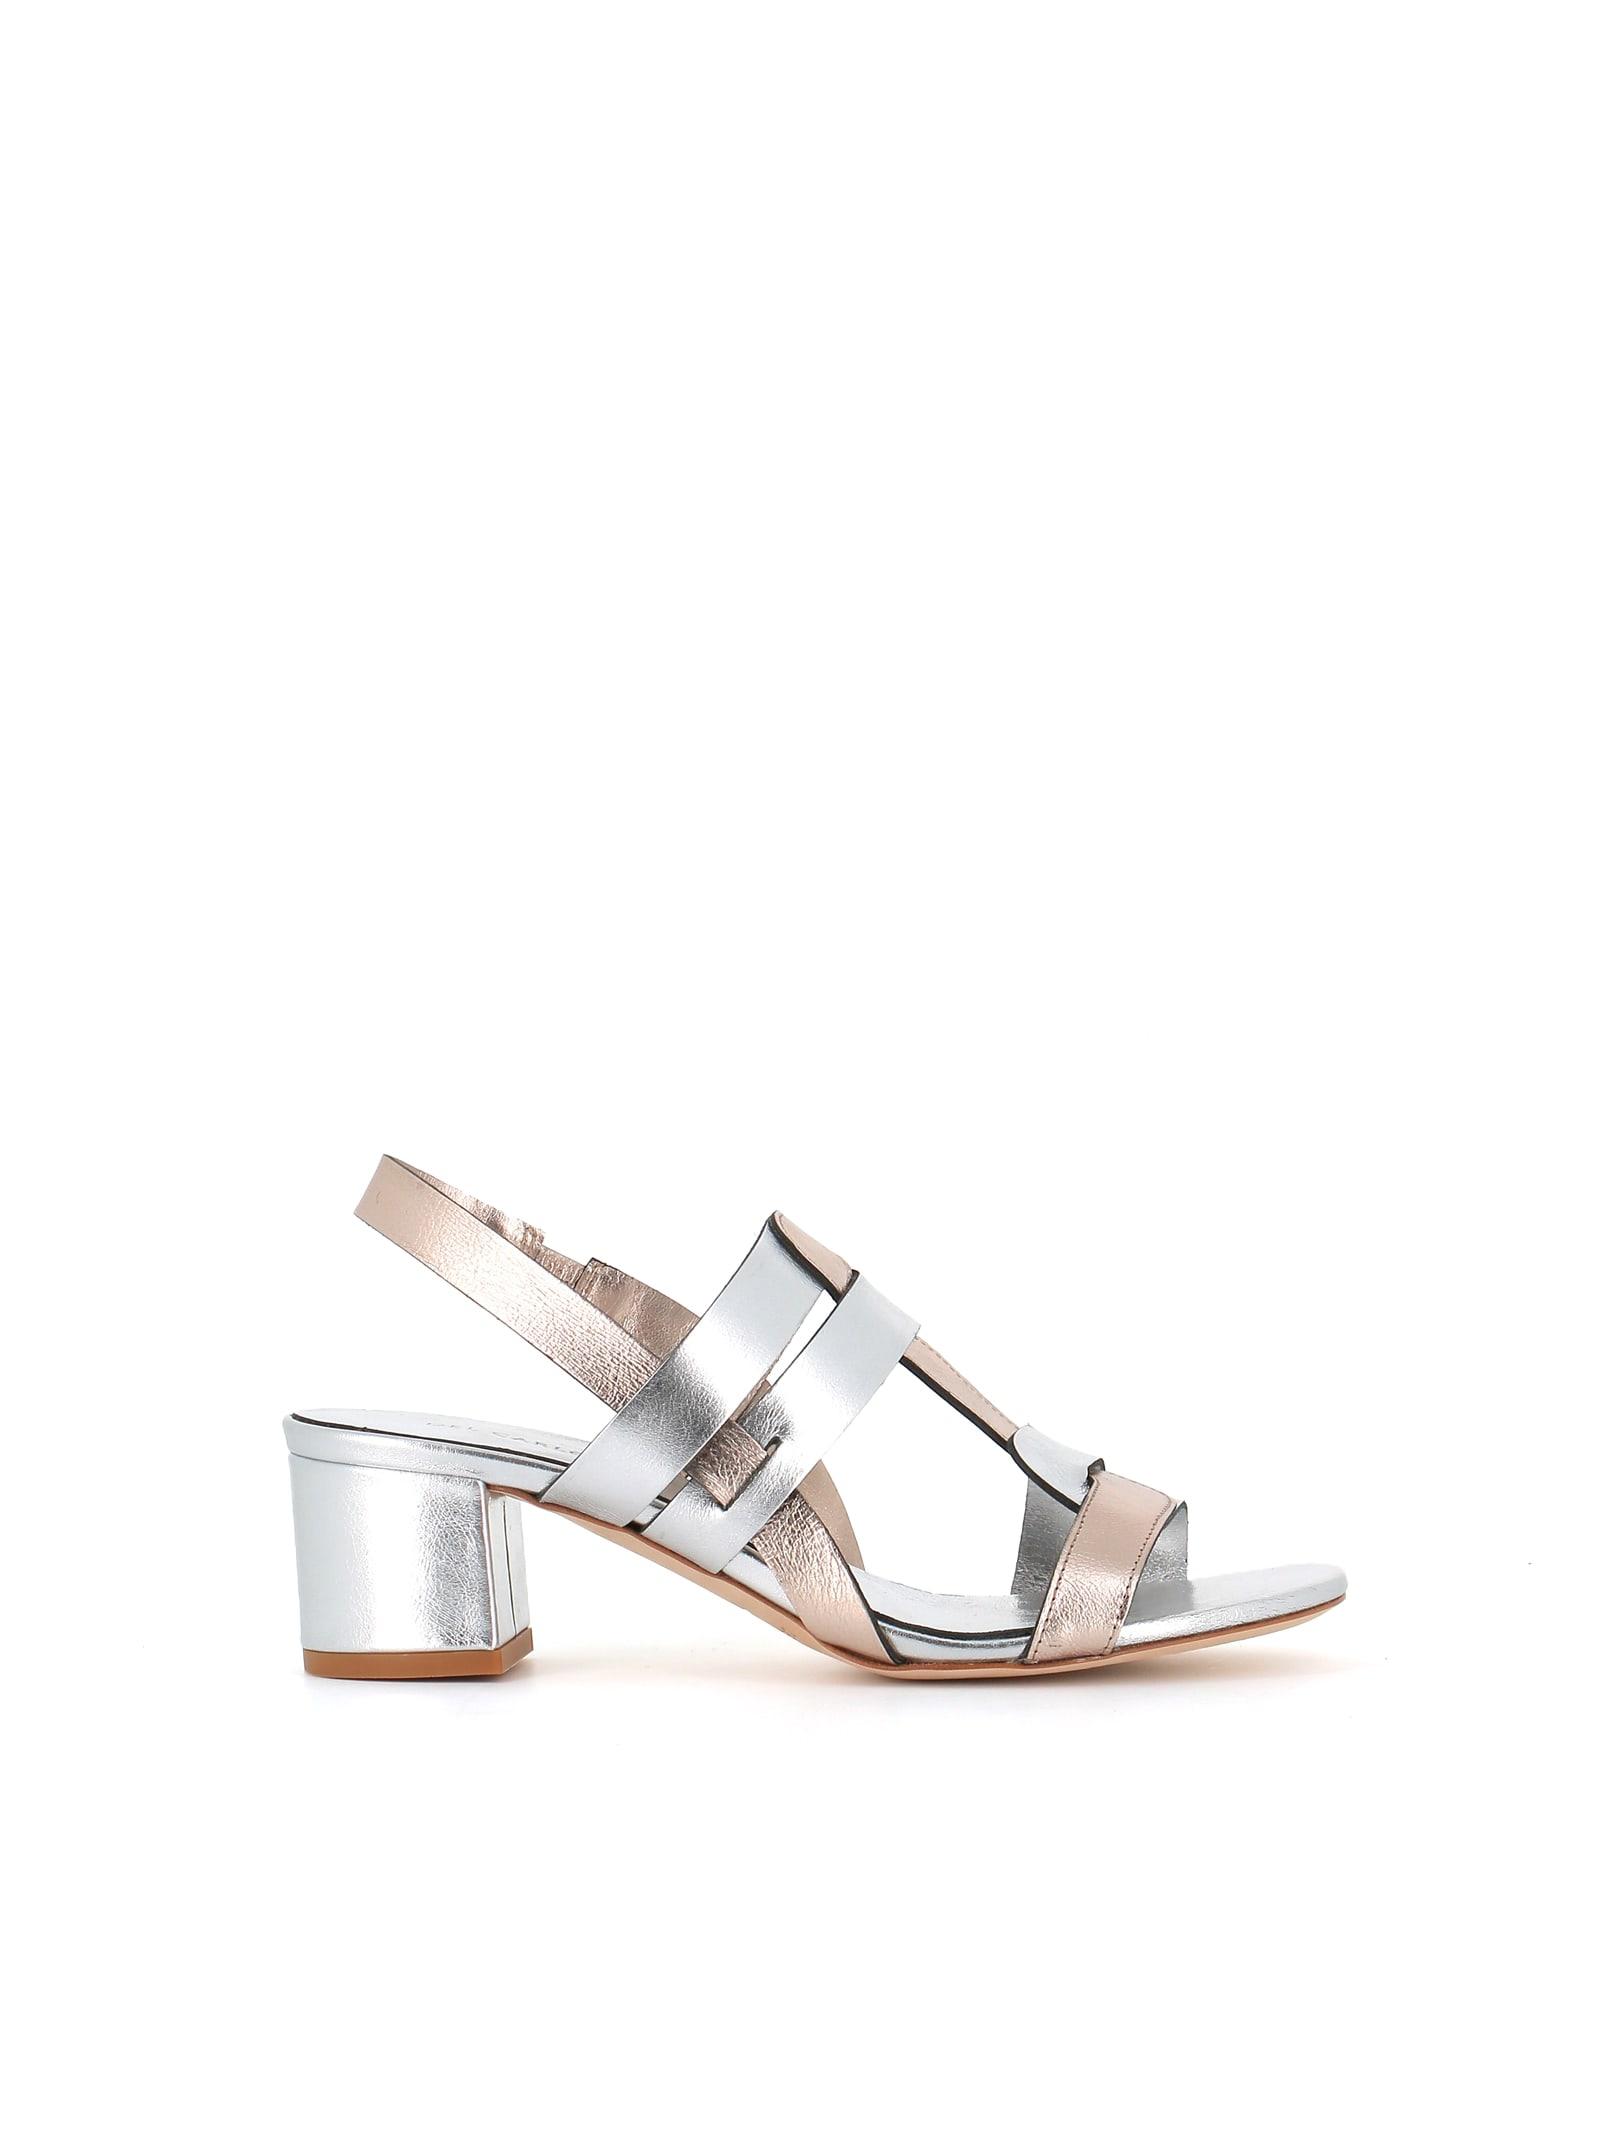 Sandal 11115